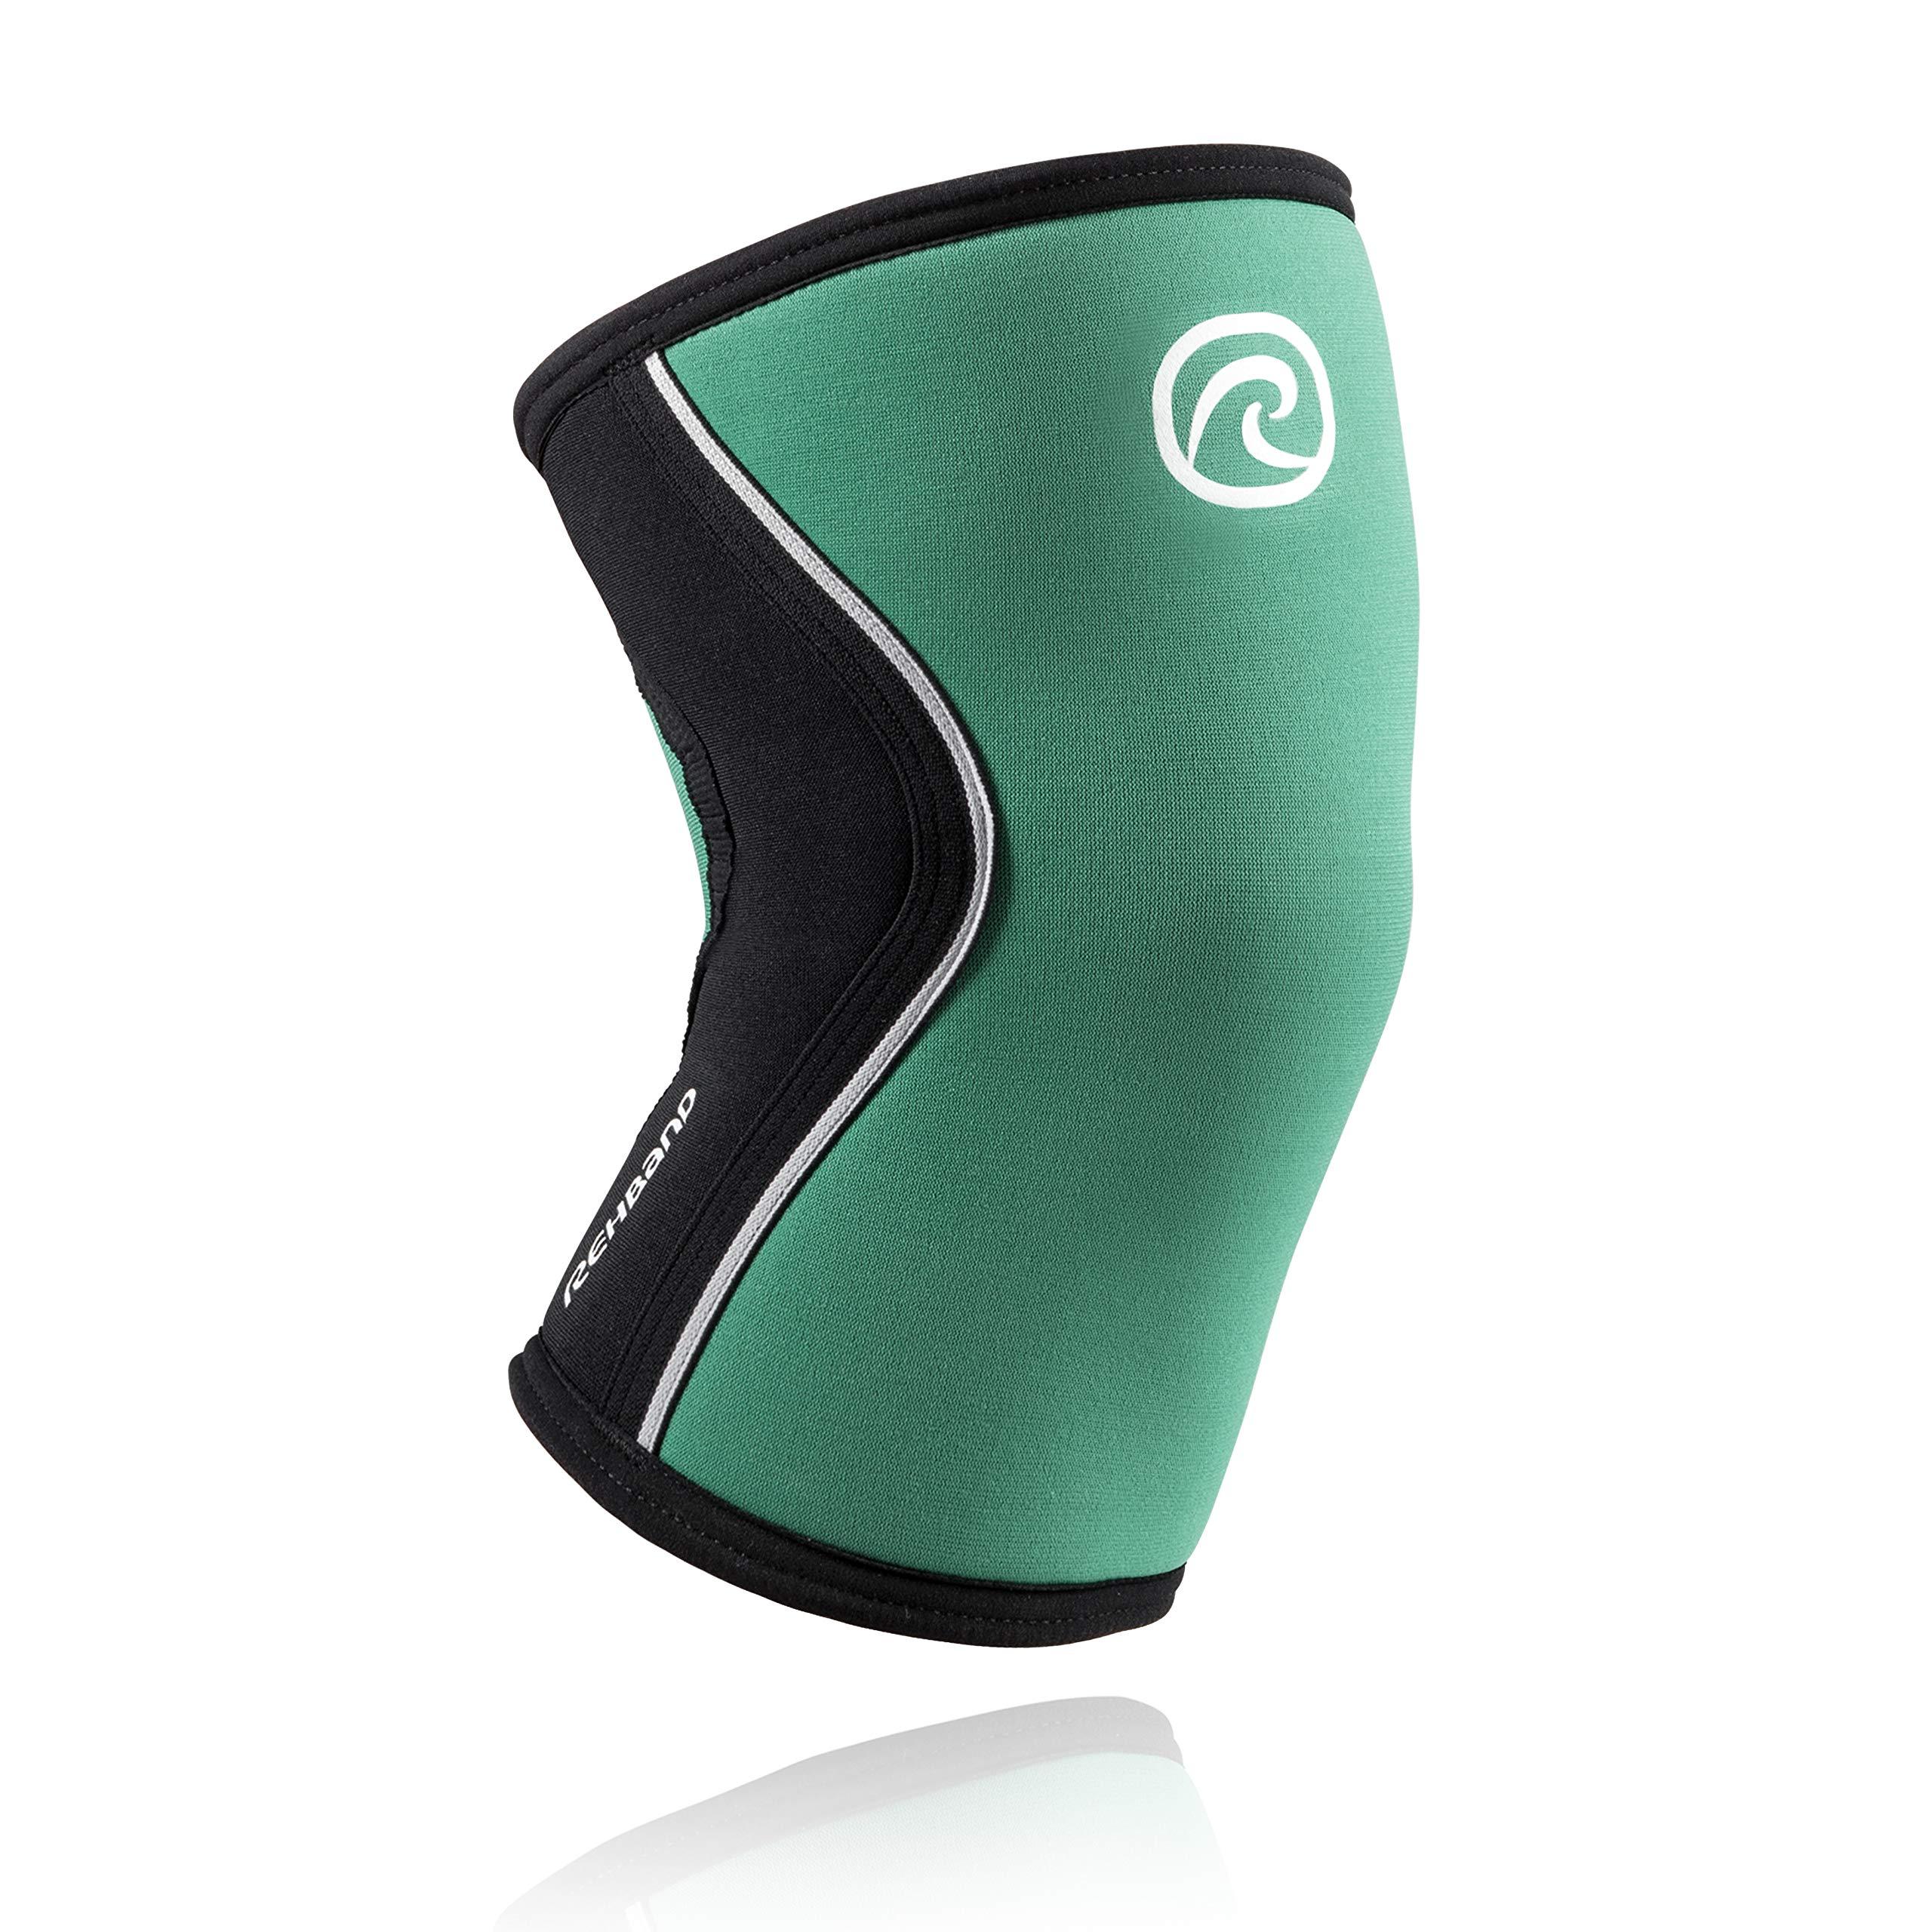 Rehband Rx Knee Sleeve 5mm - Emerald Green - X-Small